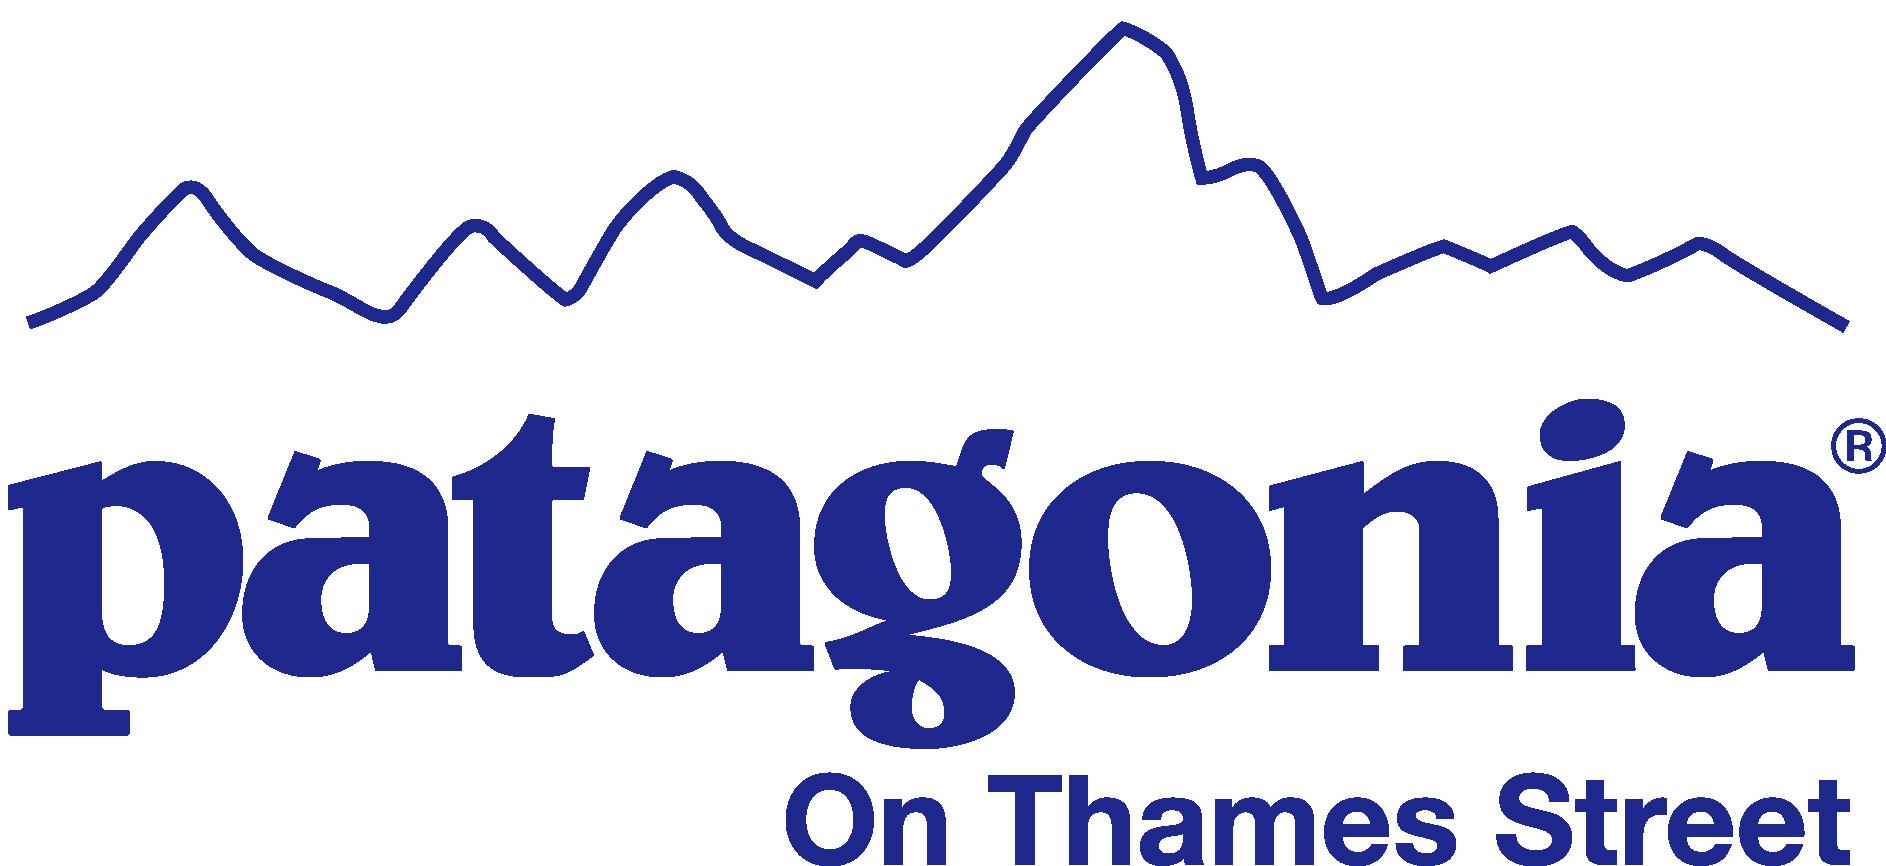 Patagonia - Team One Newport